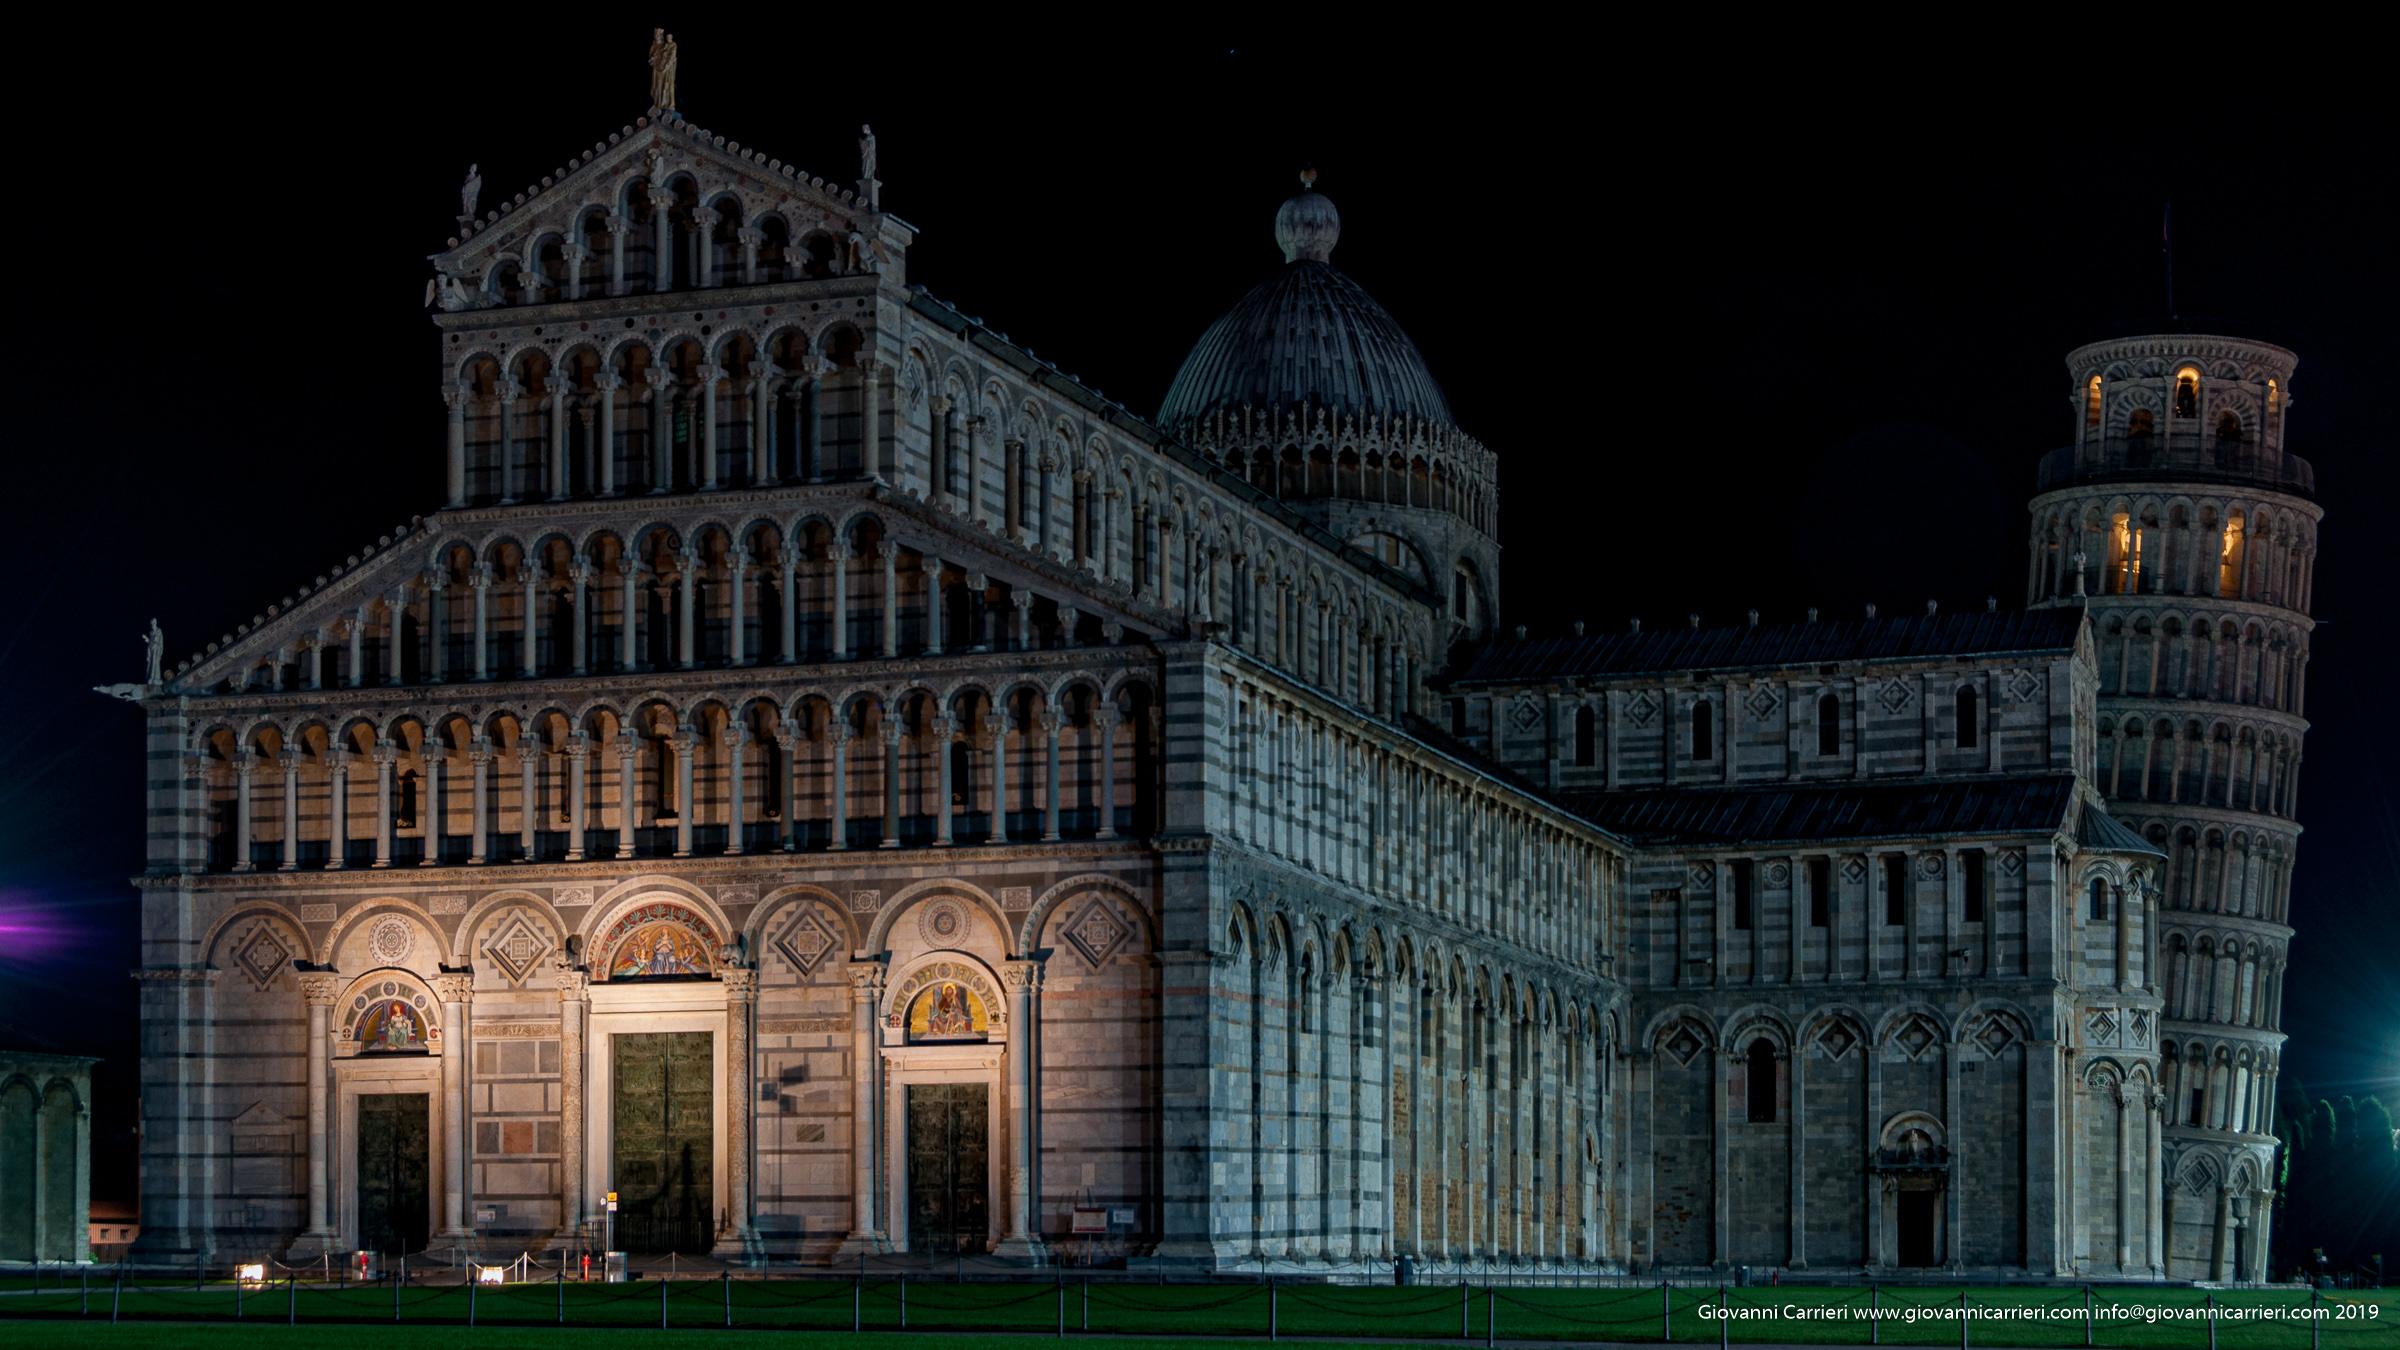 Vista frontale del Duomo di Santa Maria Assunta